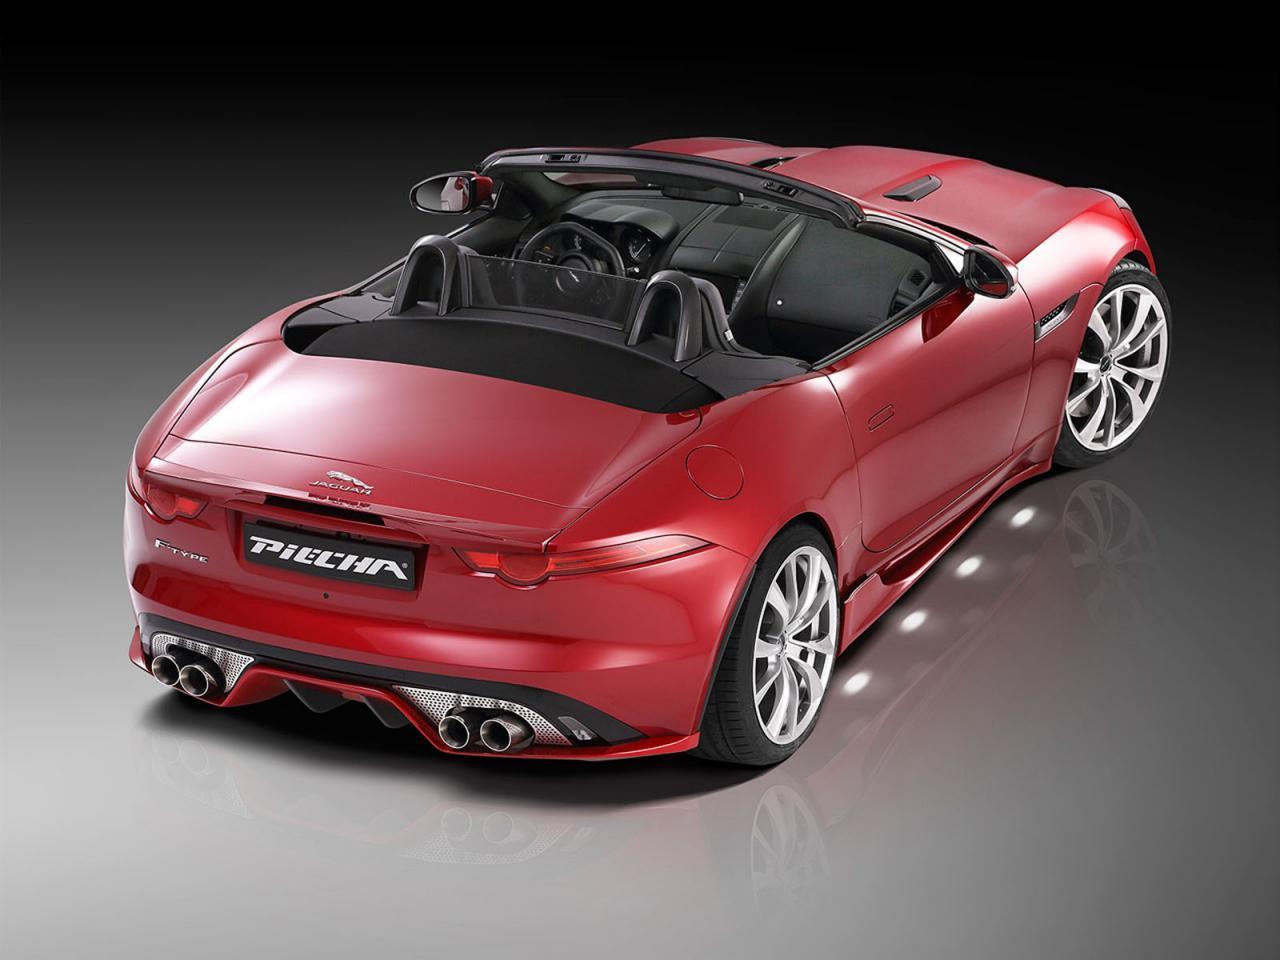 Jaguar F-Type by Piecha Design